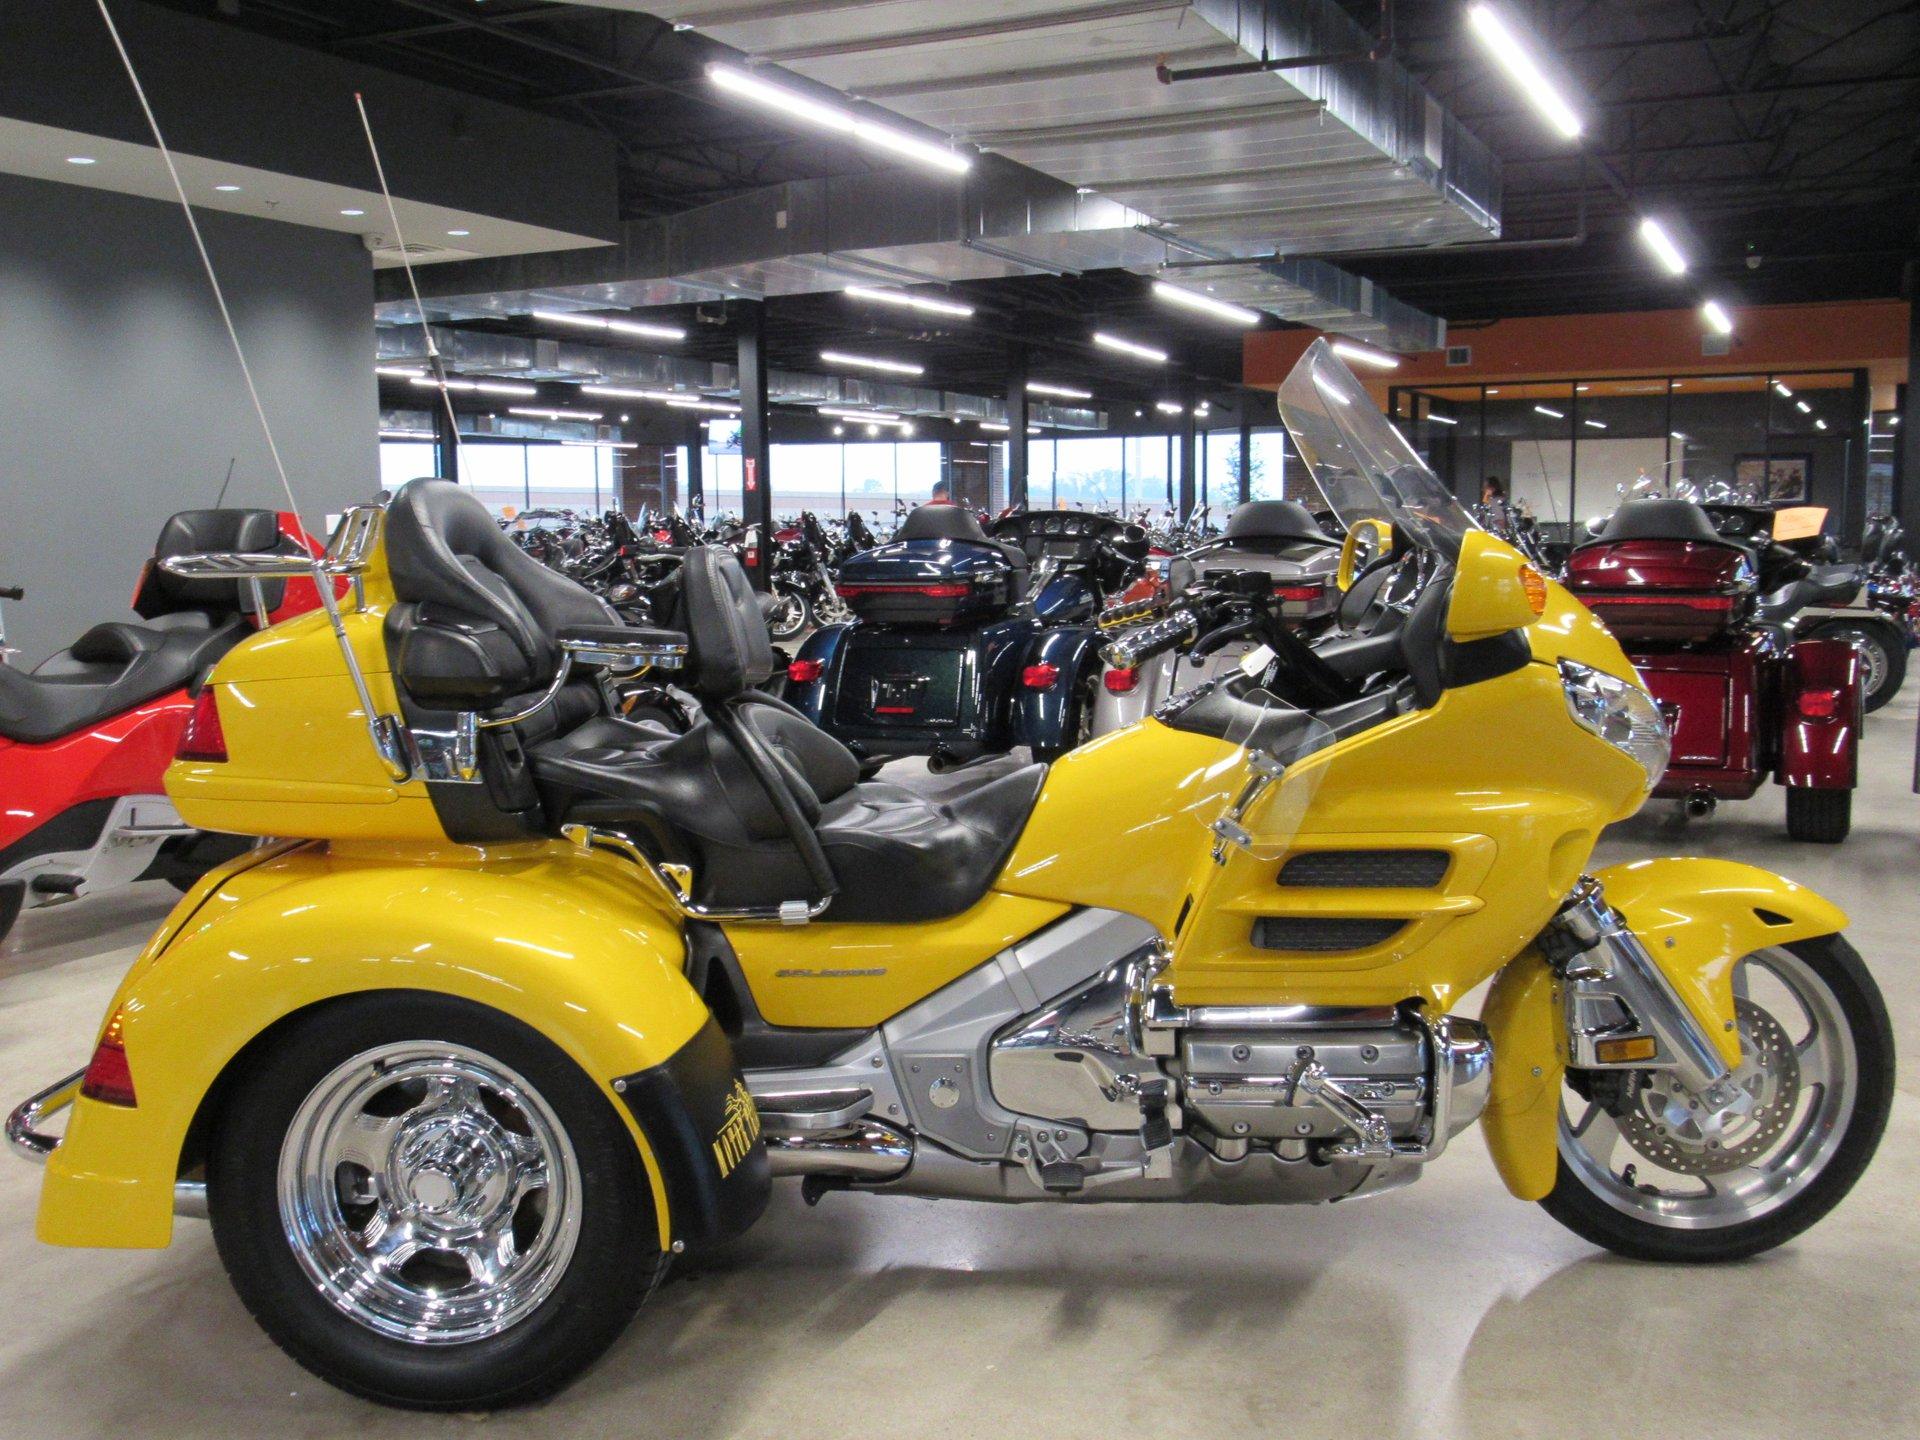 2003 honda gold wing trike gl18003 w motor trike conversion